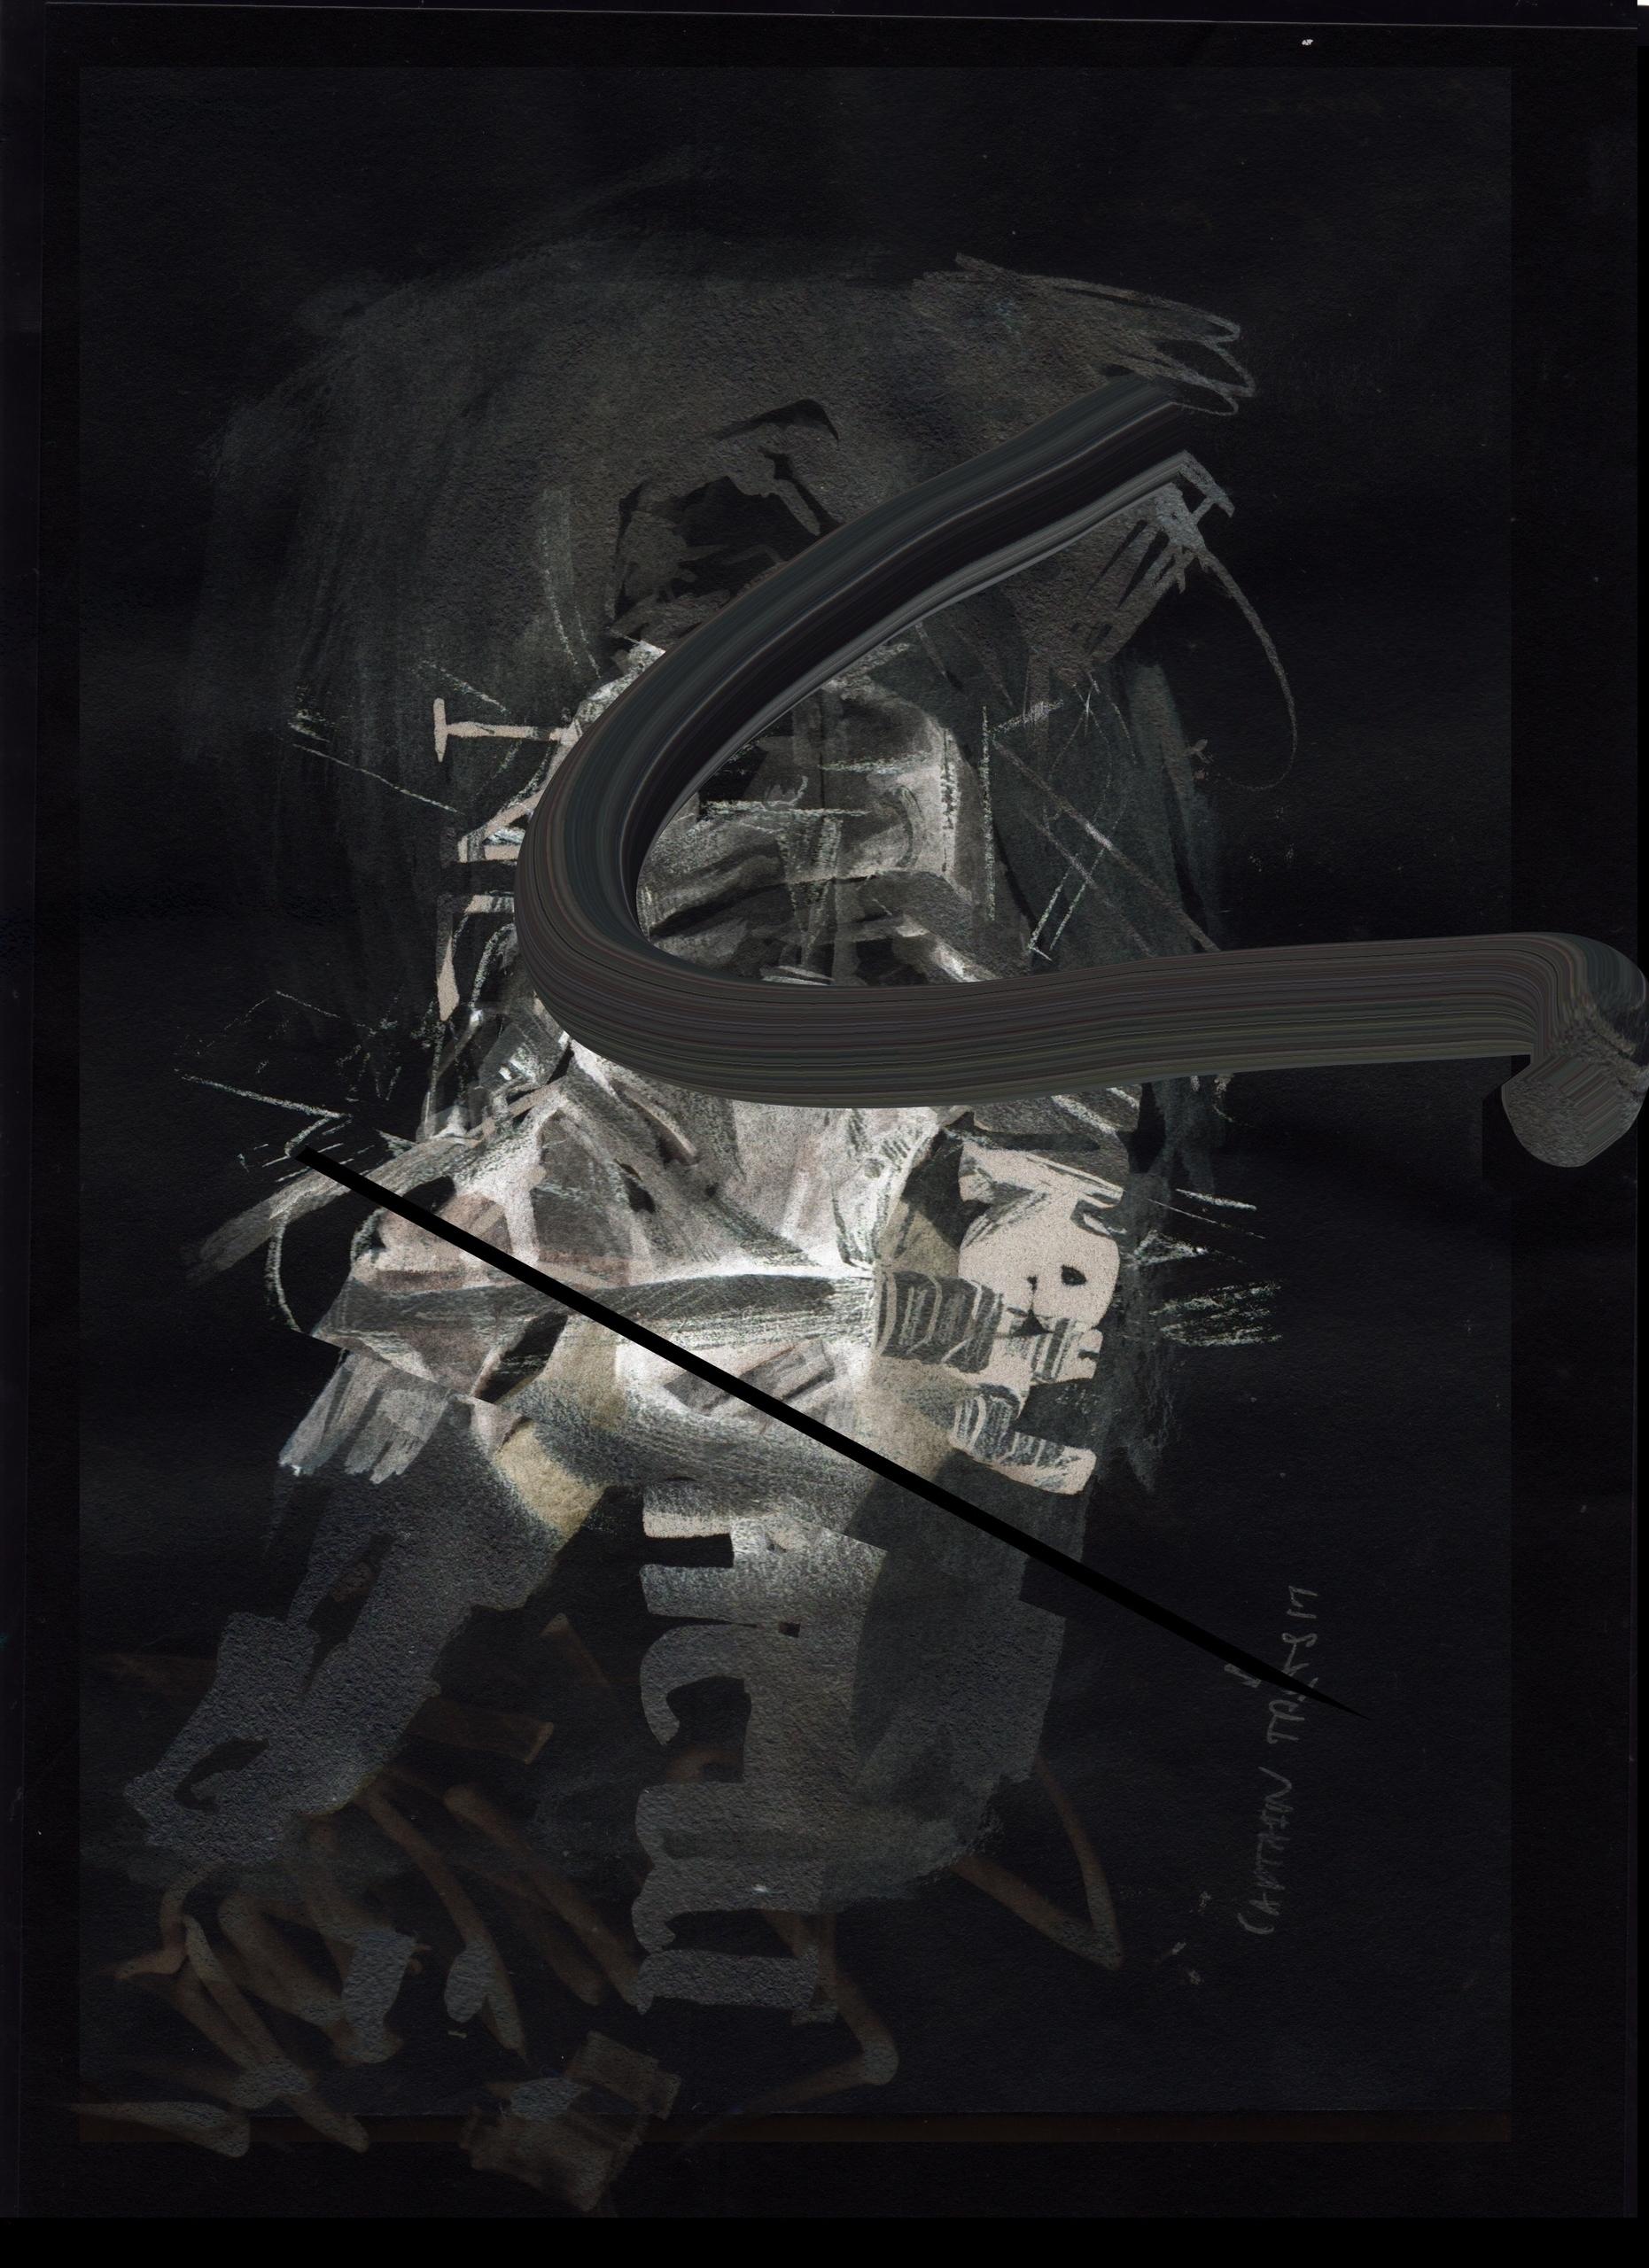 Machine - art, youngartists, digitalart - jlanthony | ello